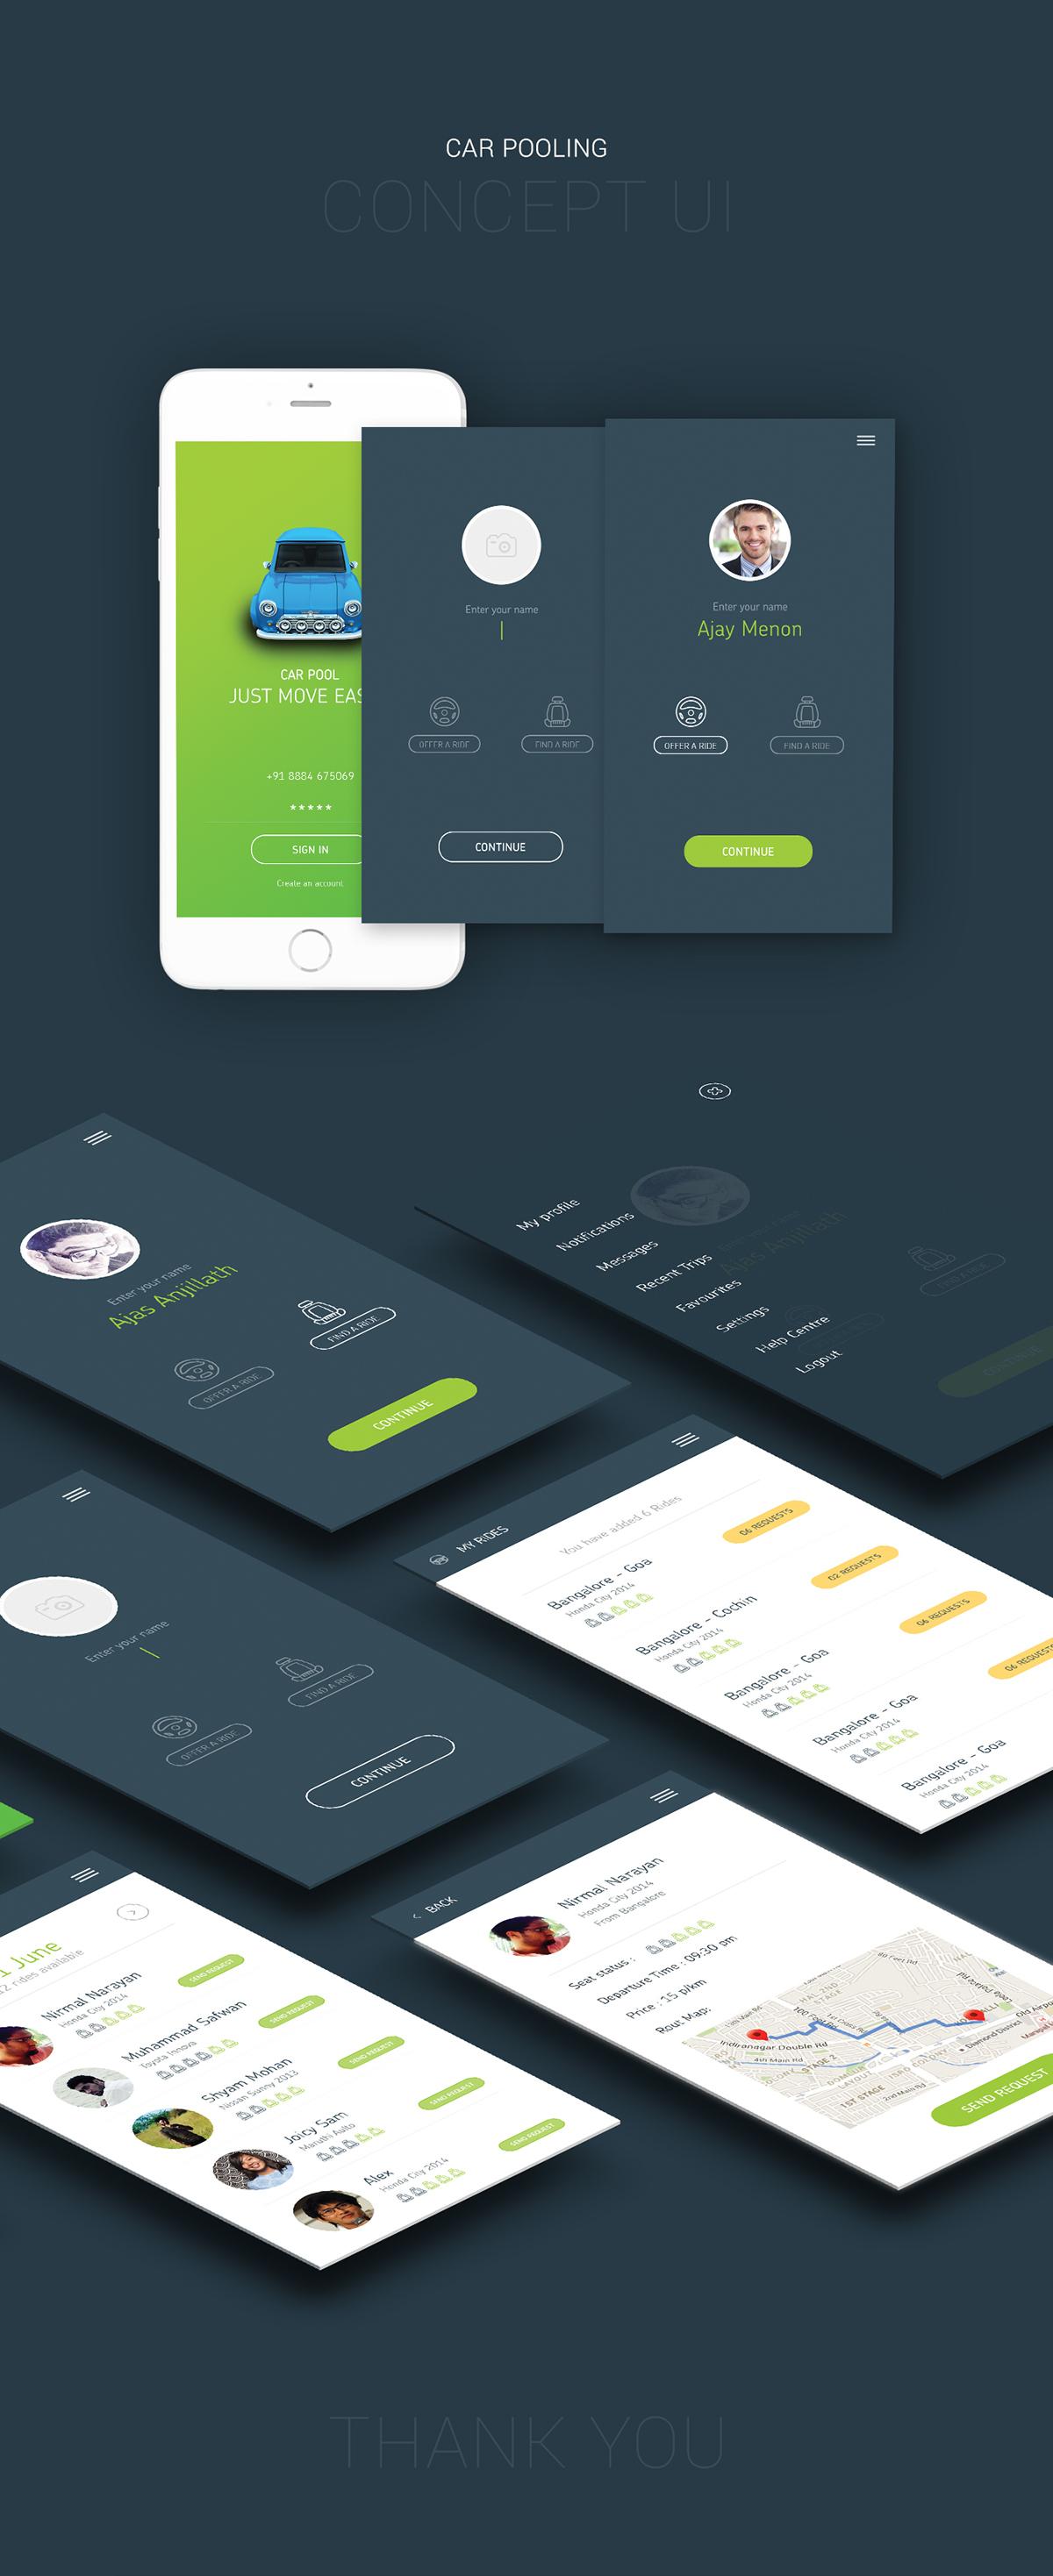 Car Pooling App Concept Ui On Behance